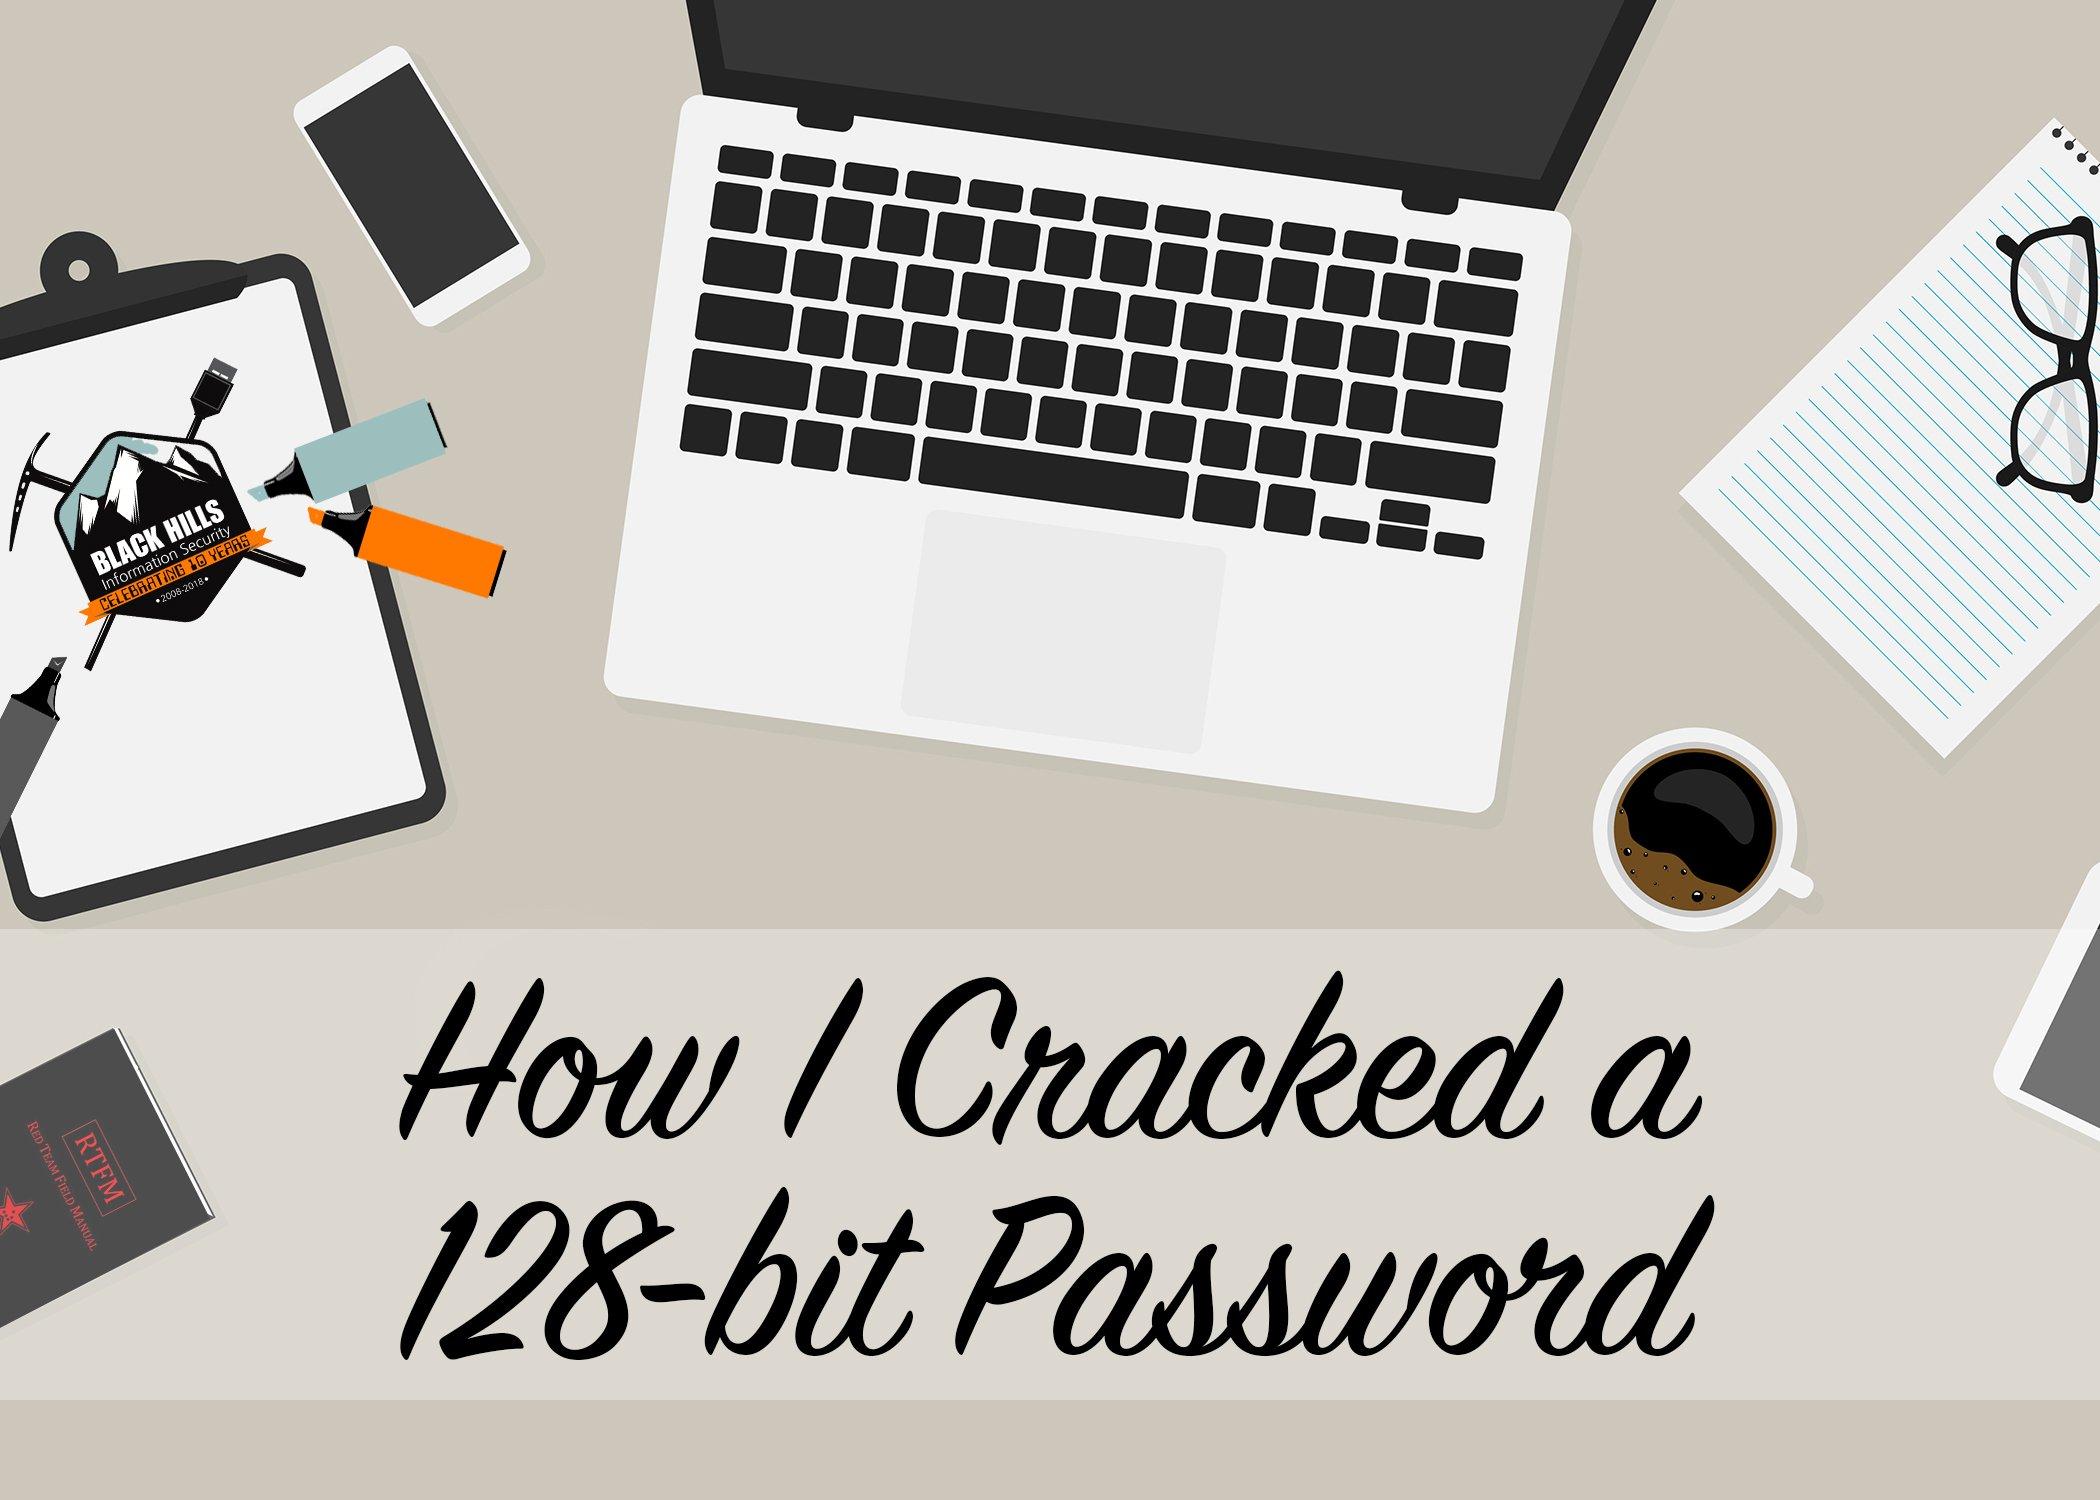 How I Cracked a 128-bit Password - Black Hills Information